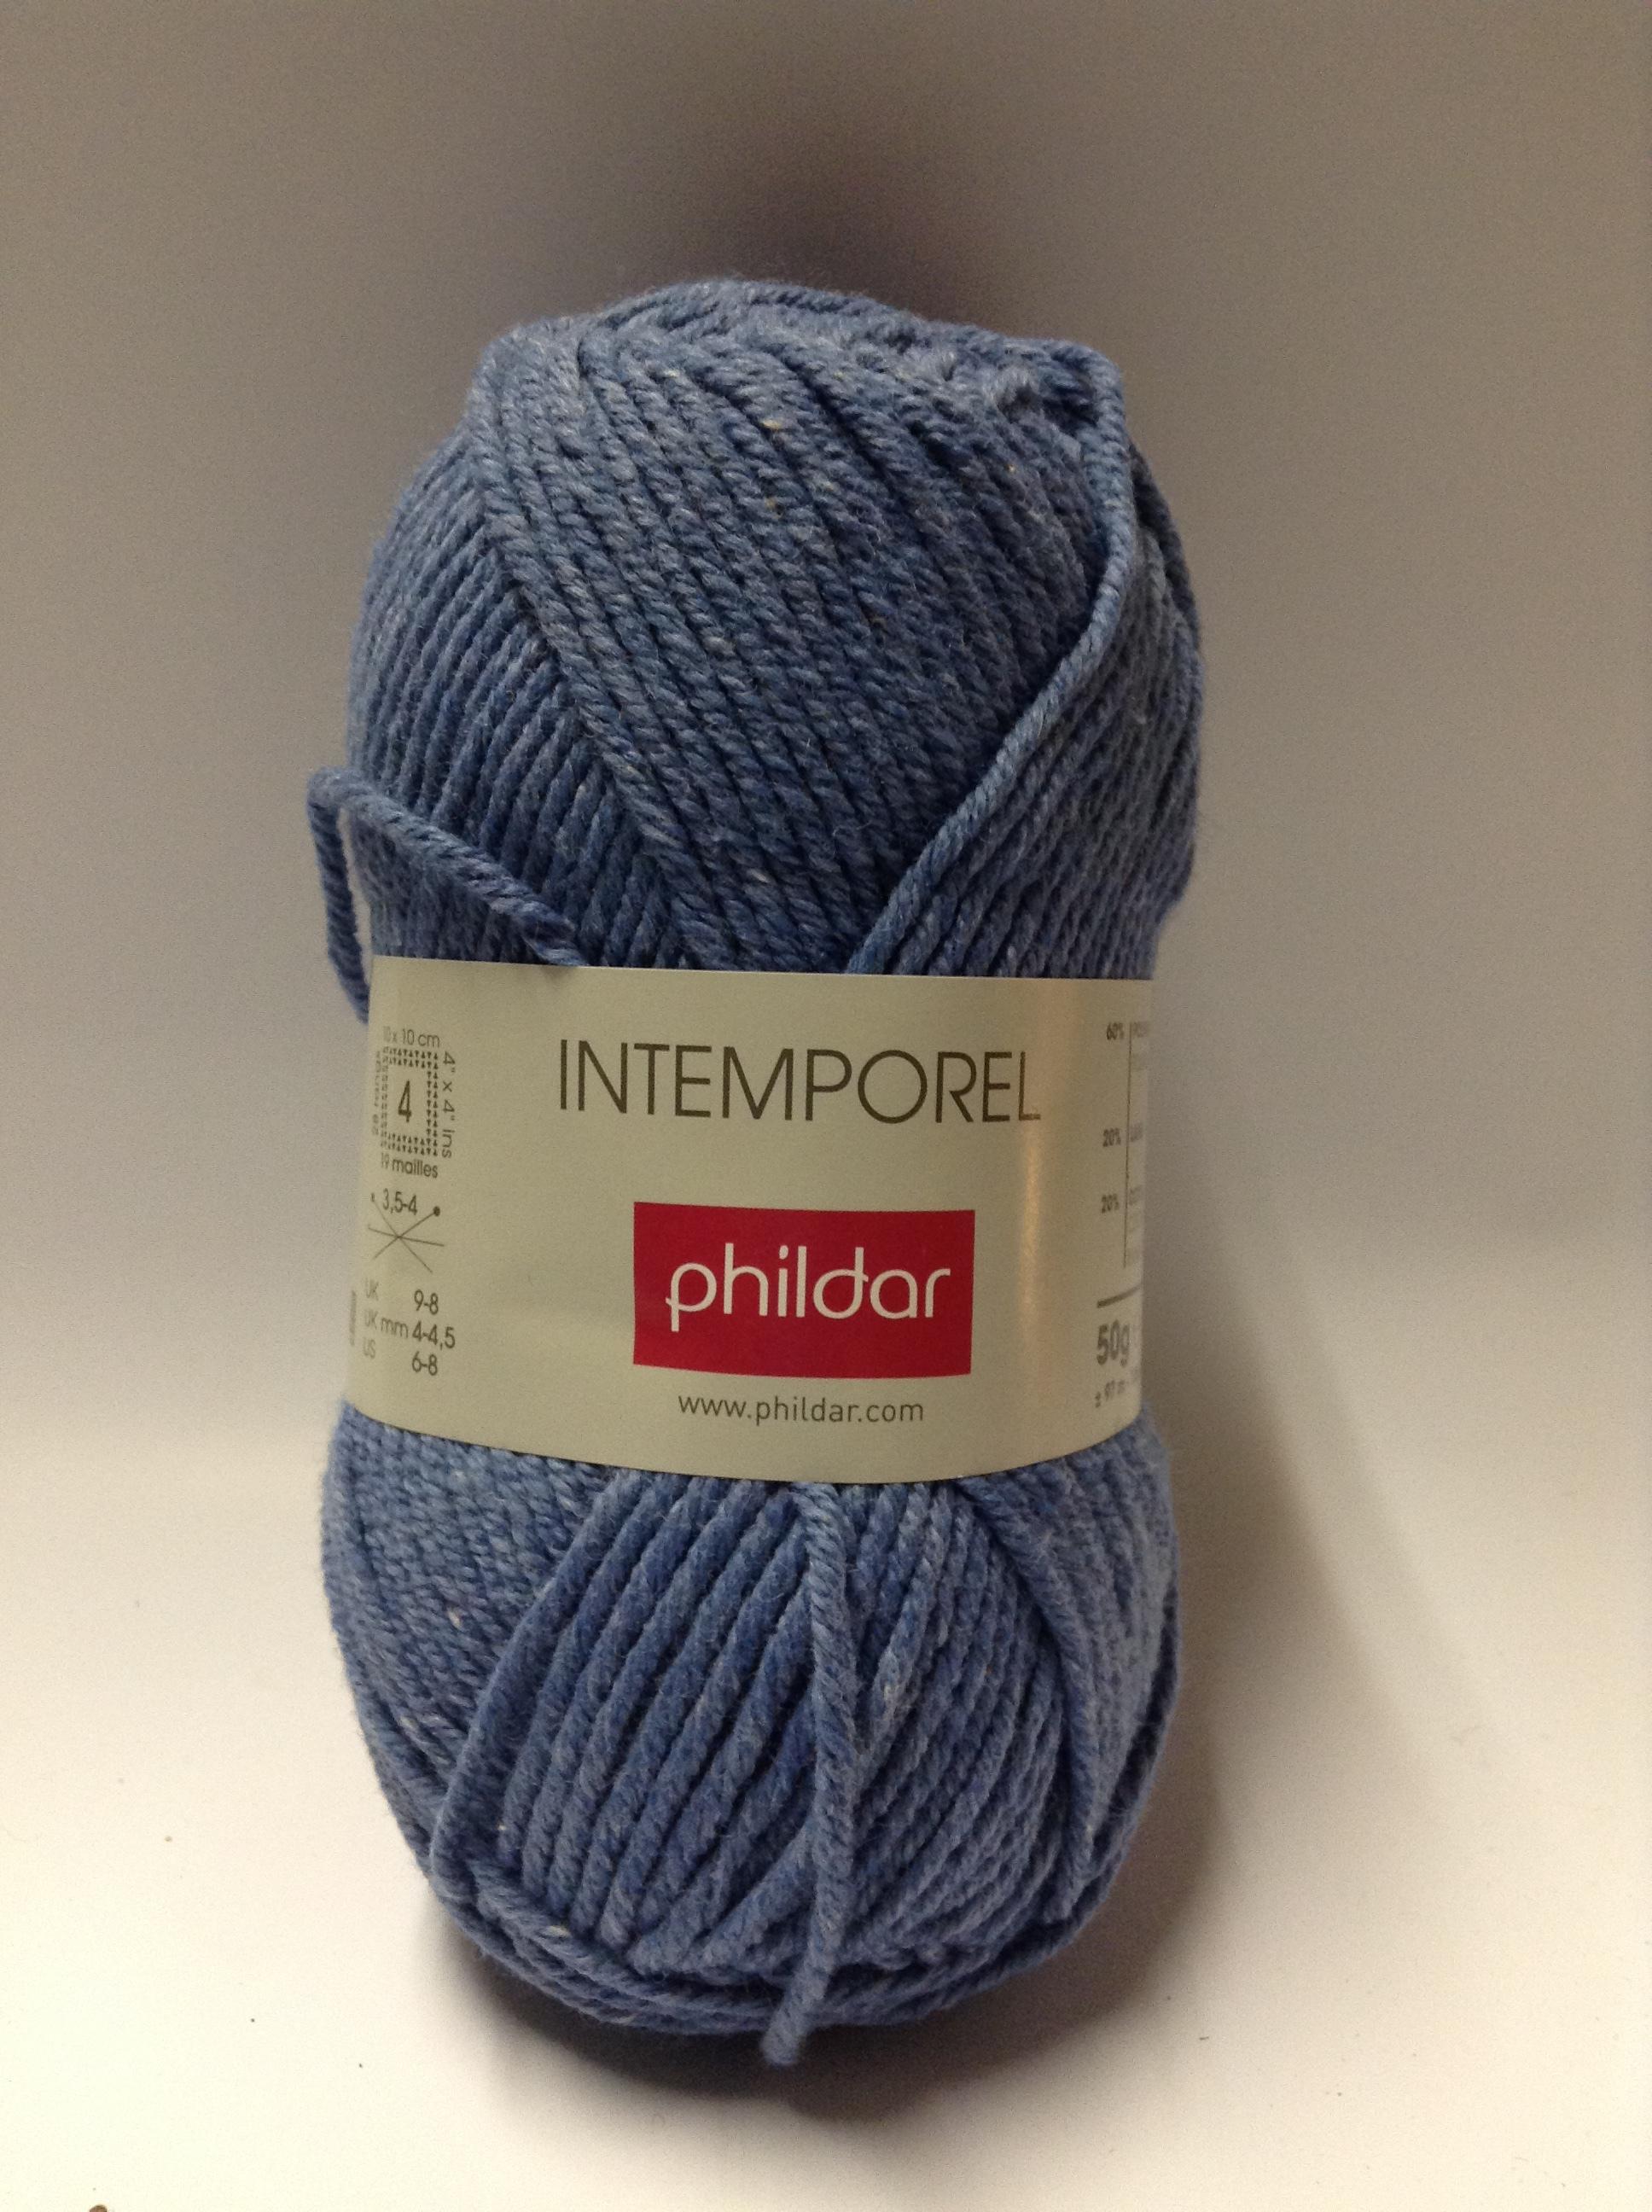 laine phildar fil intemporel